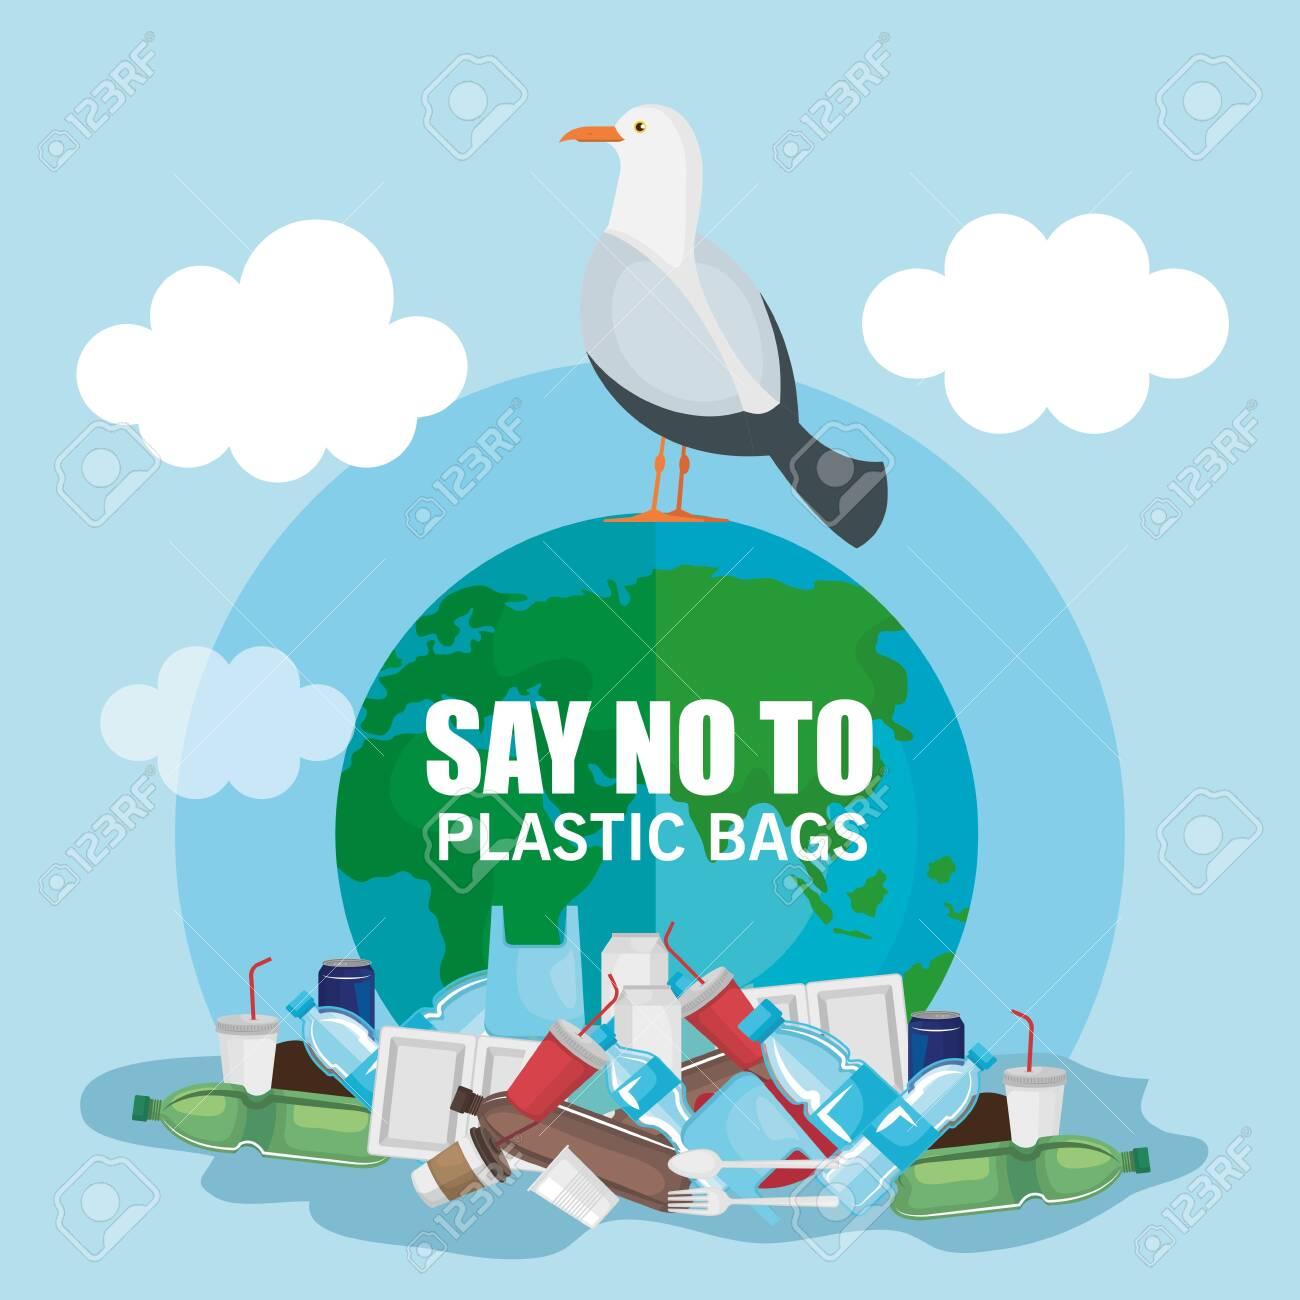 plastics waste pollution and dove bird vector illustration - 124878691